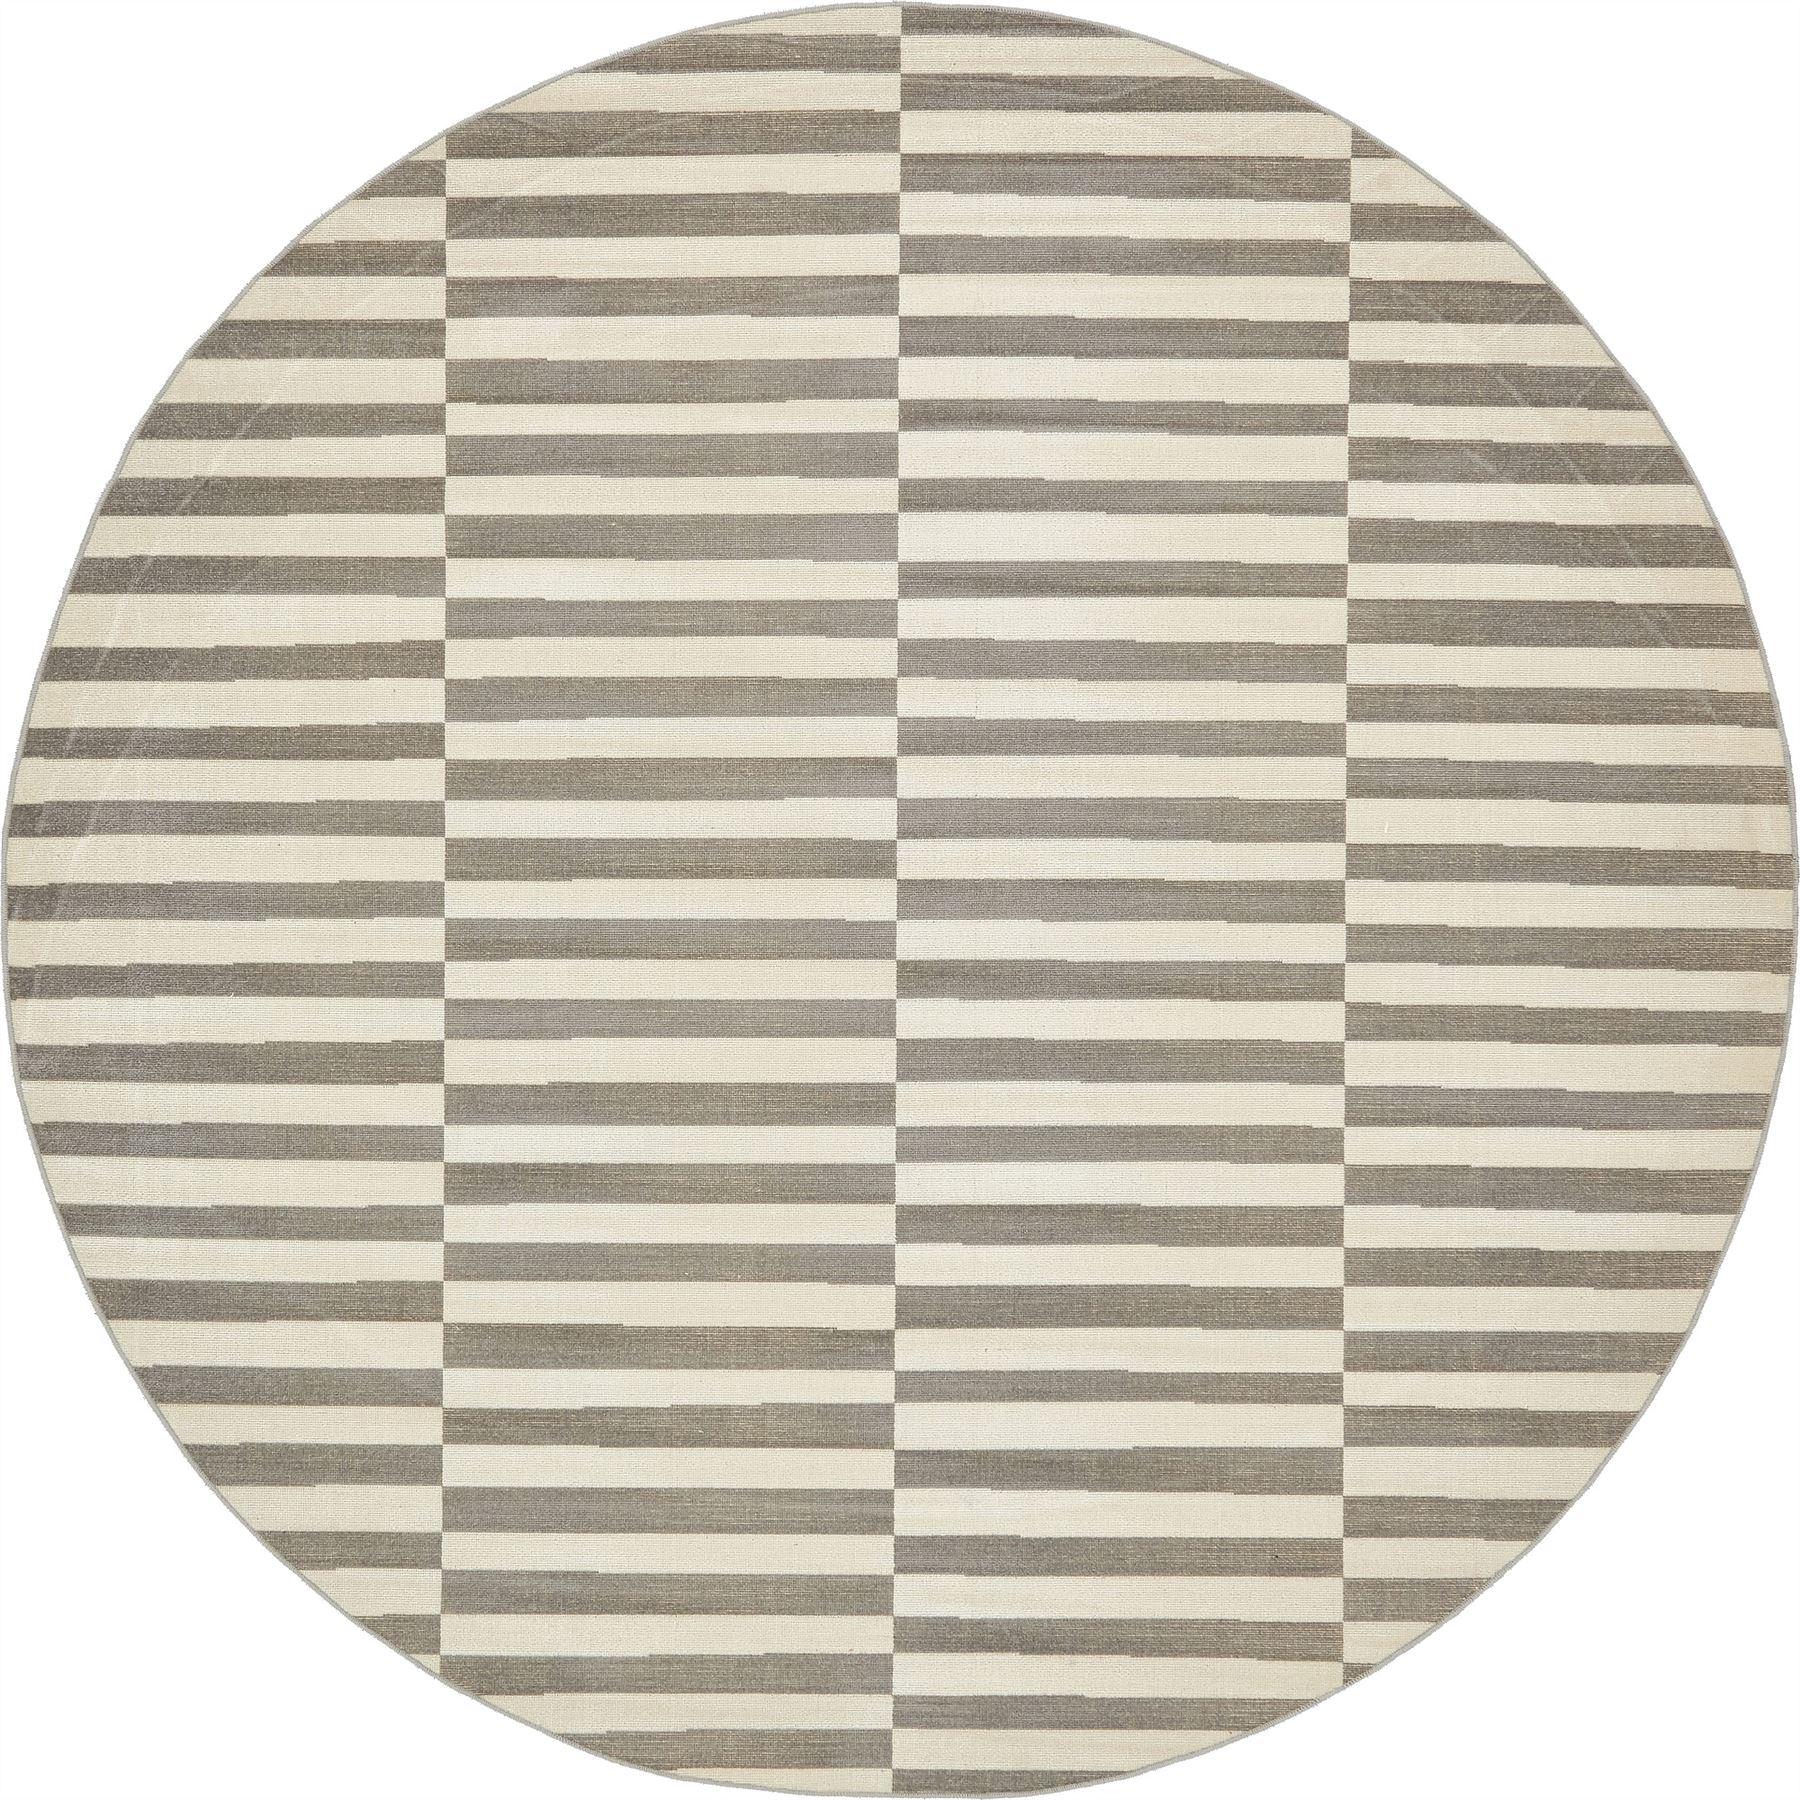 modern area rug striped contemporary large round carpet design  - modernarearugstripedcontemporarylargeroundcarpet